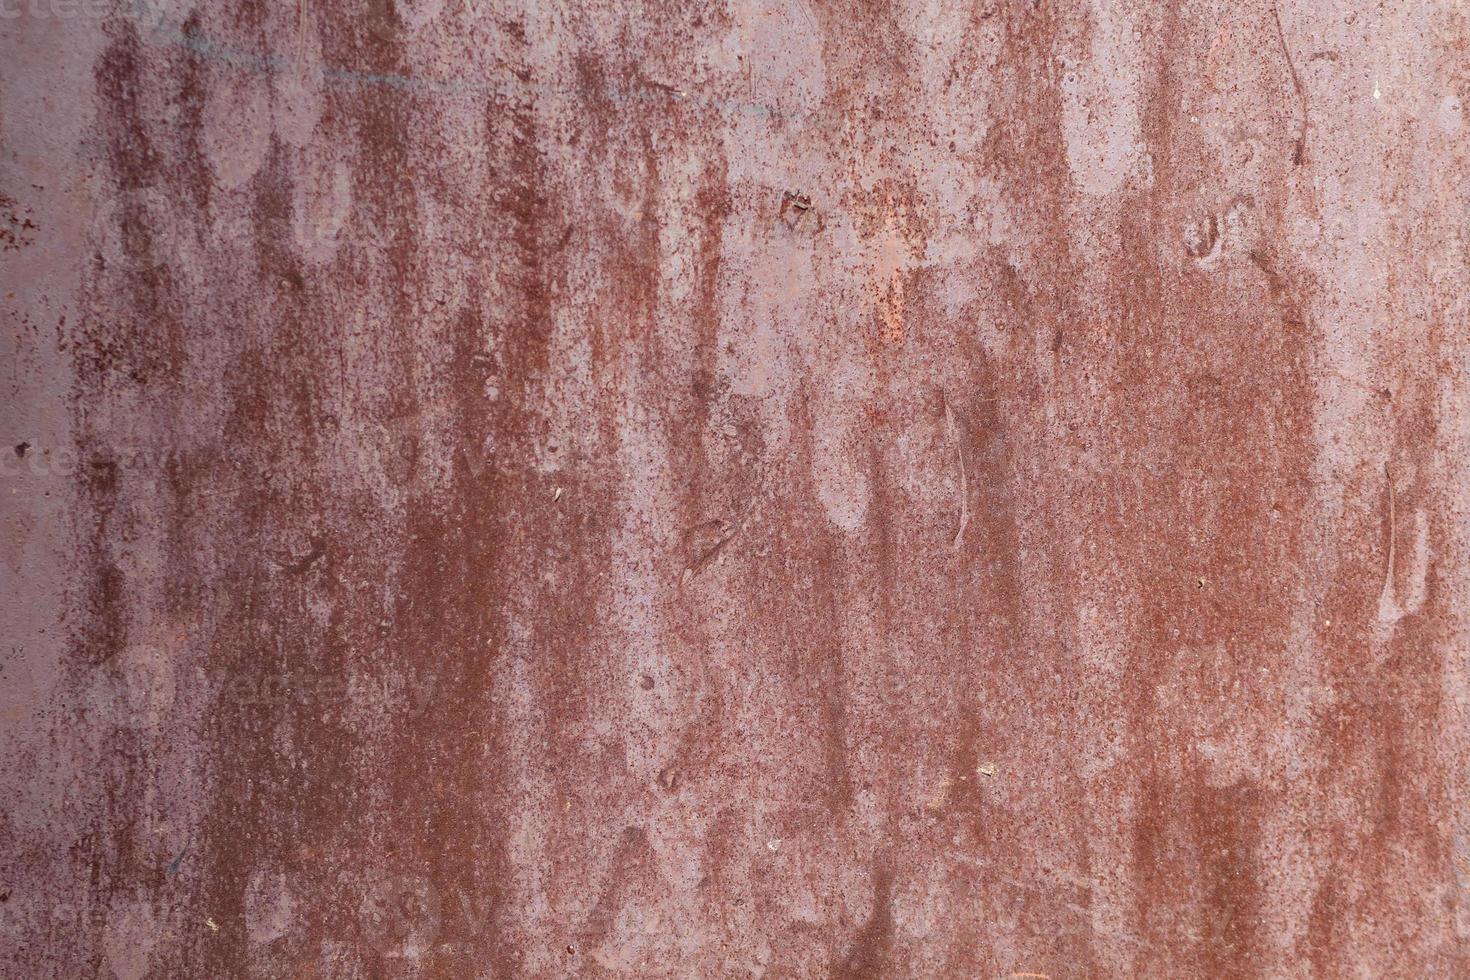 struttura metallica verniciata arrugginita foto